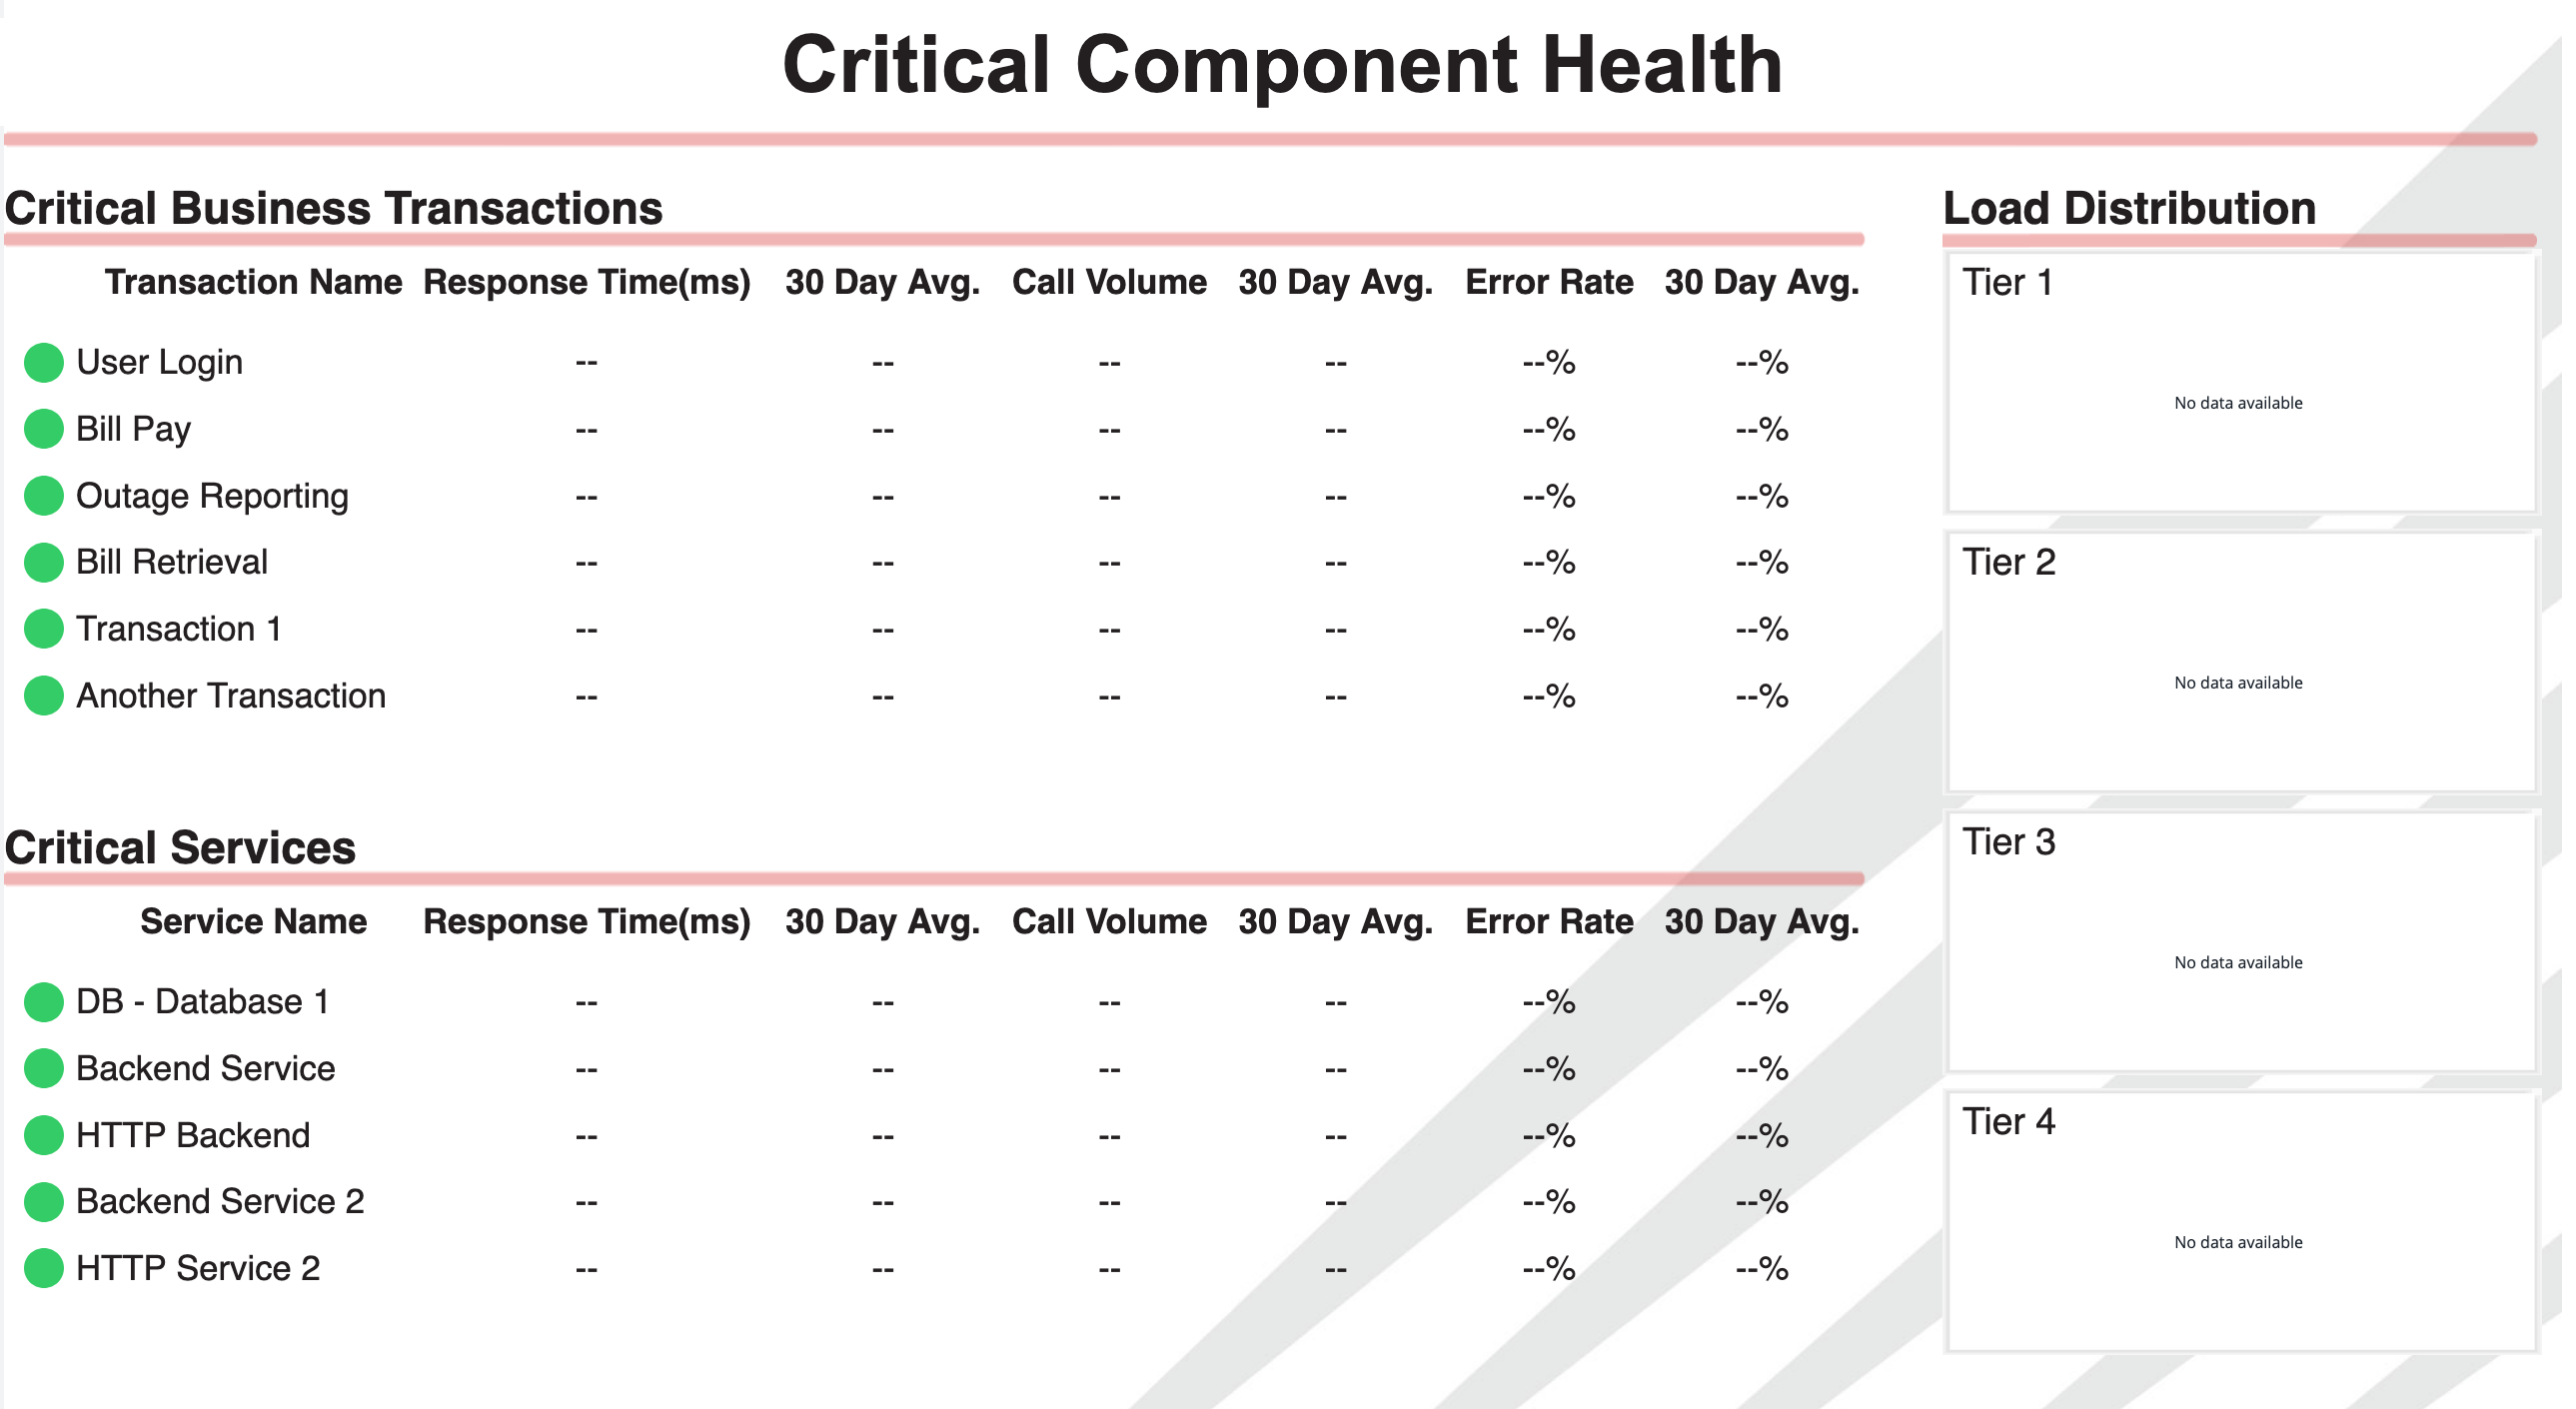 Critical Component Health Dashboard